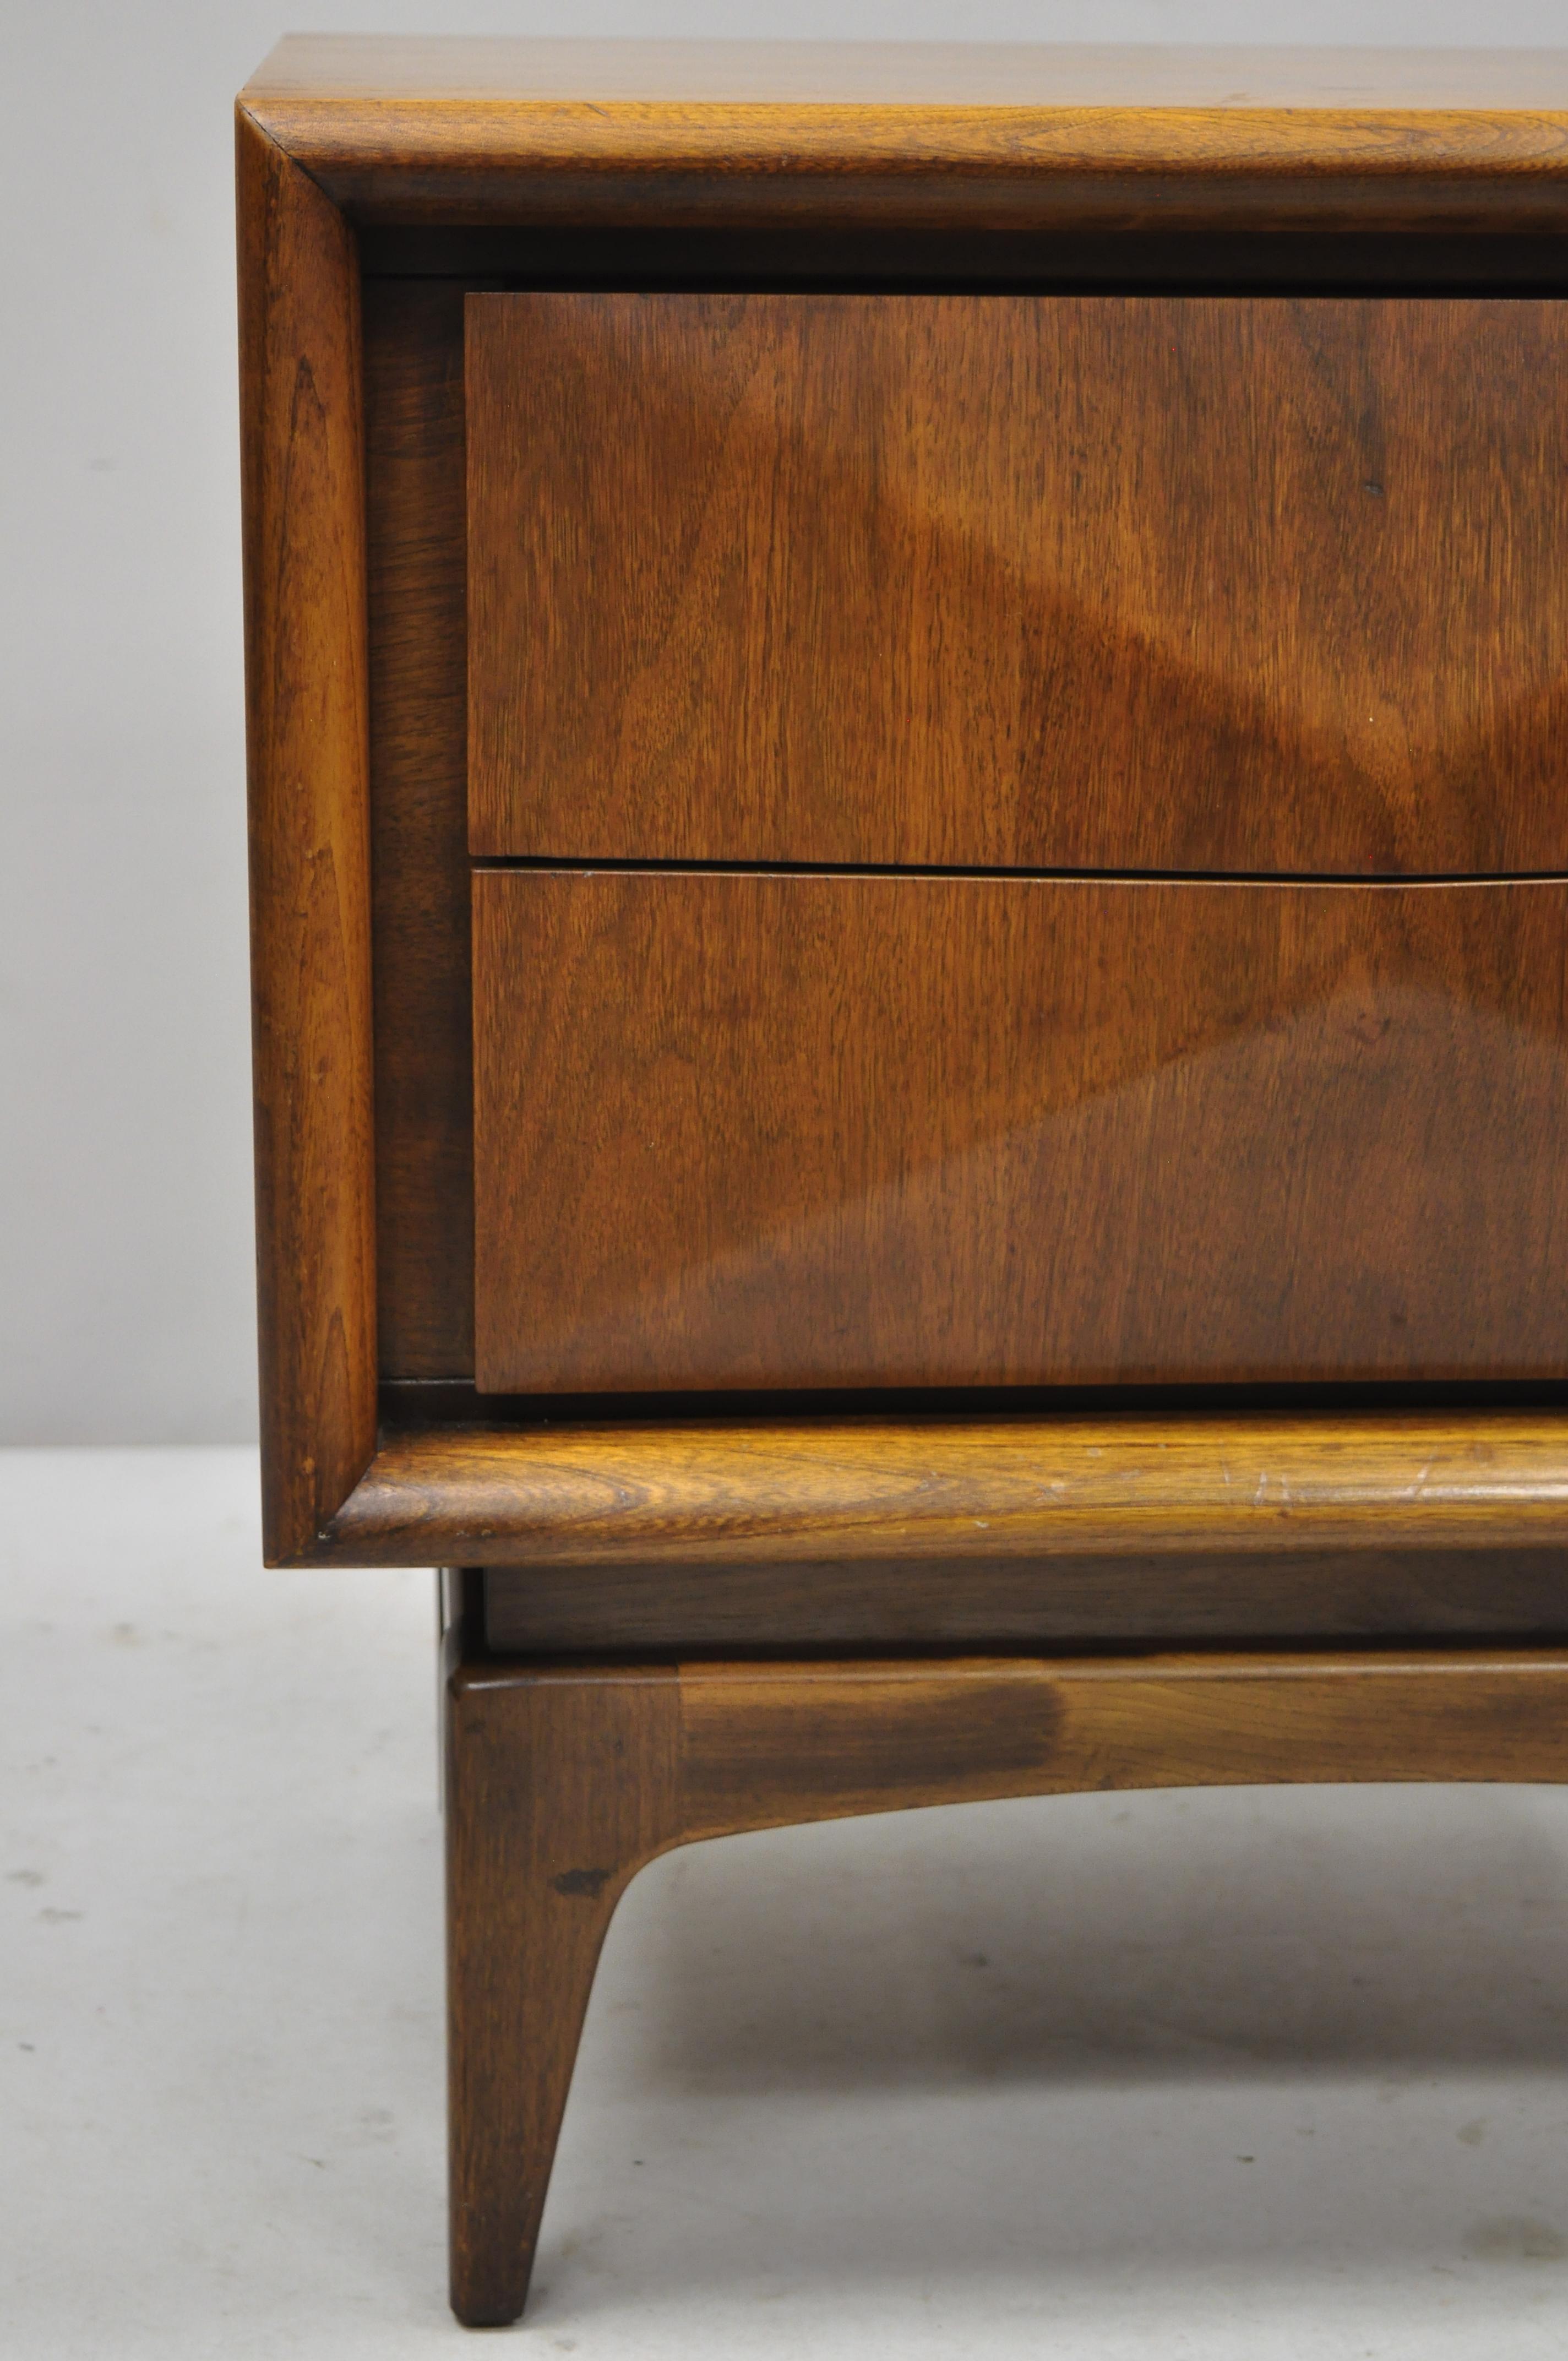 Vintage Mid Century Modern Diamond Front Walnut Nightstand By United Furniture At 1stdibs